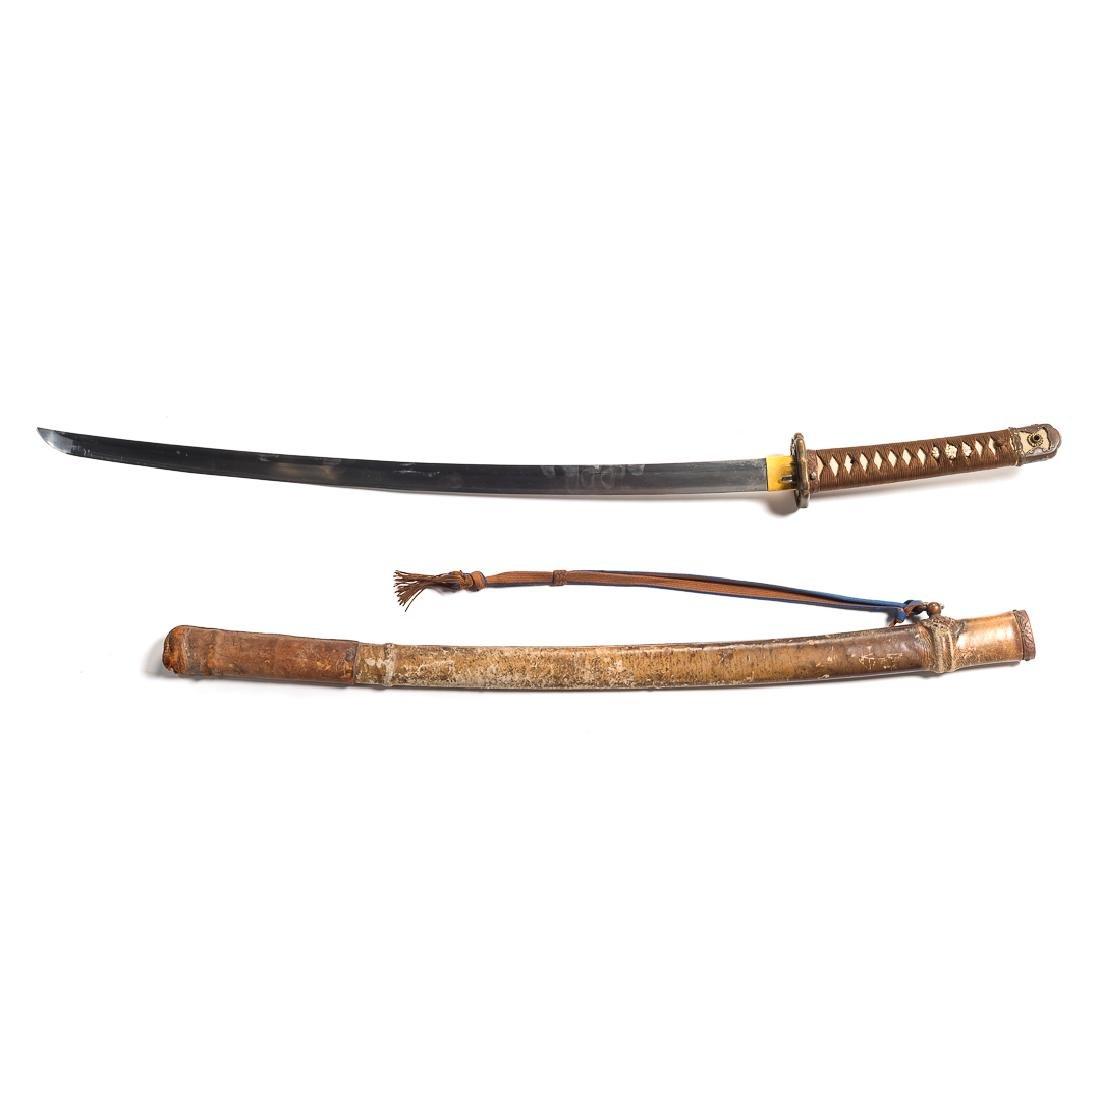 WWII era Japanese Samurai style sword